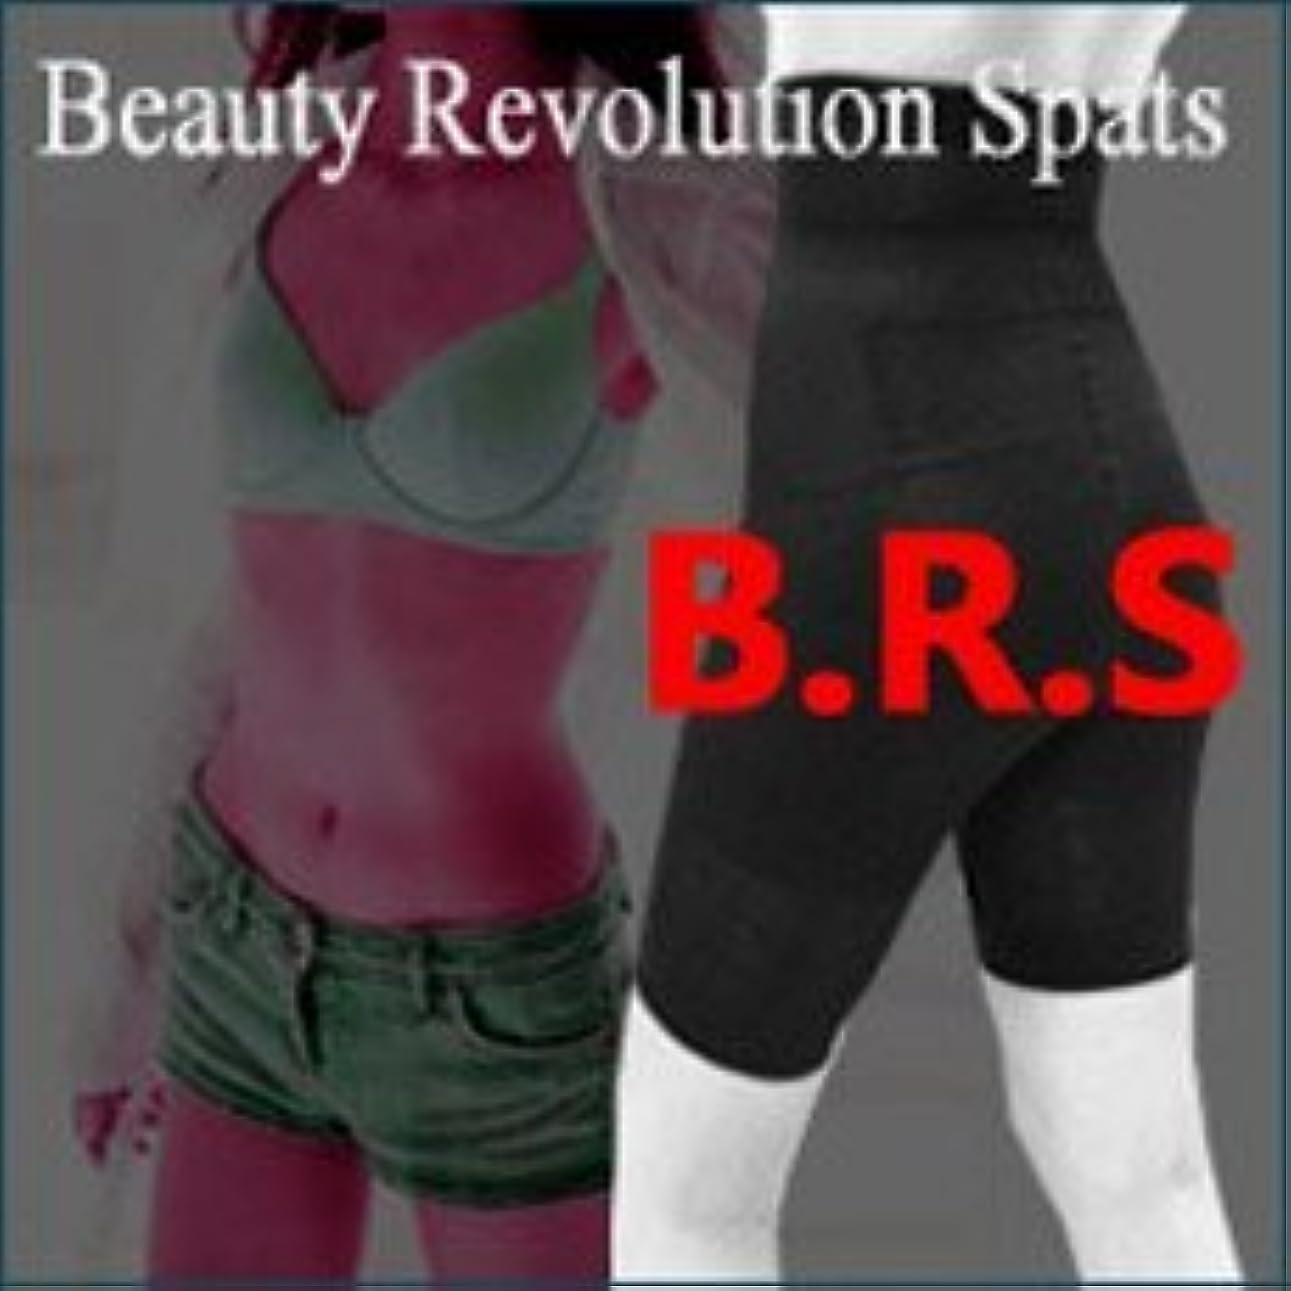 B.R.S Lサイズ(360度可変圧着 骨盤矯正スパッツ)